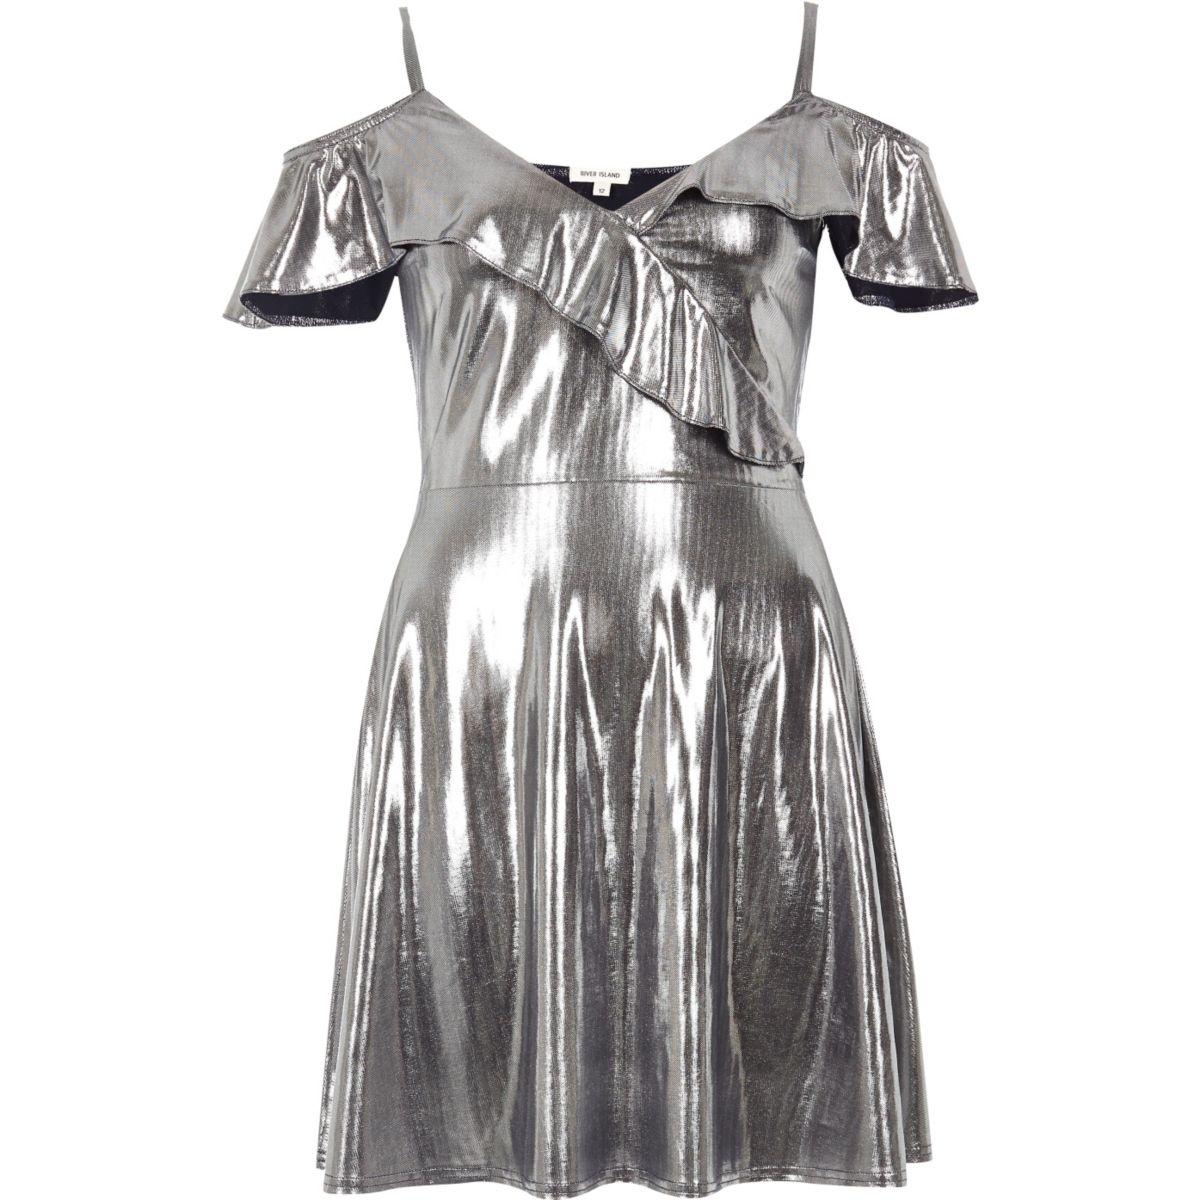 Silver frill skater dress